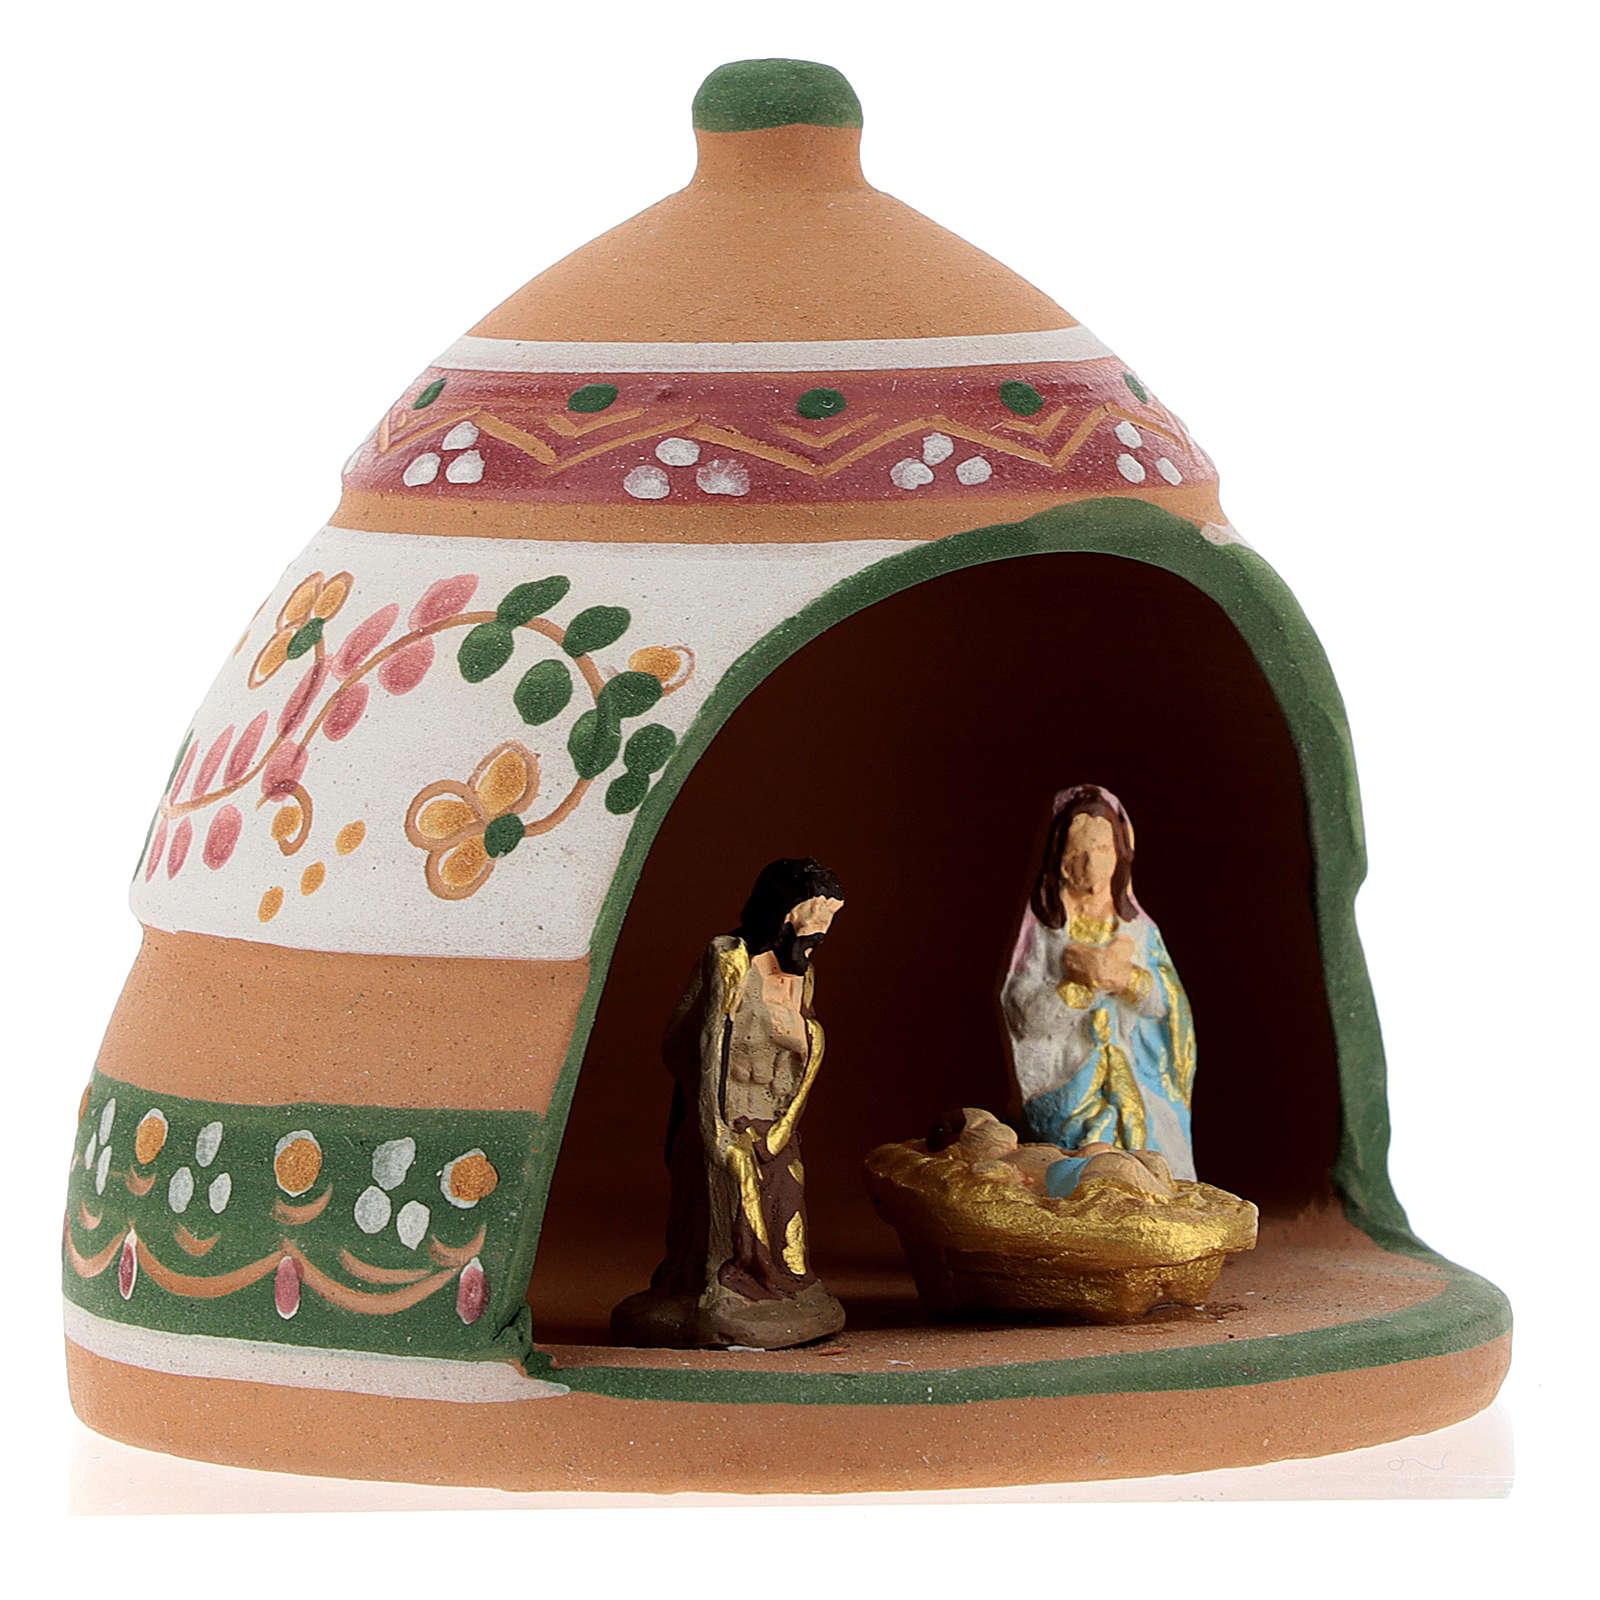 Capanna ceramica colorata natività 3 cm country rosa verde 10x10x10 cm Deruta 4